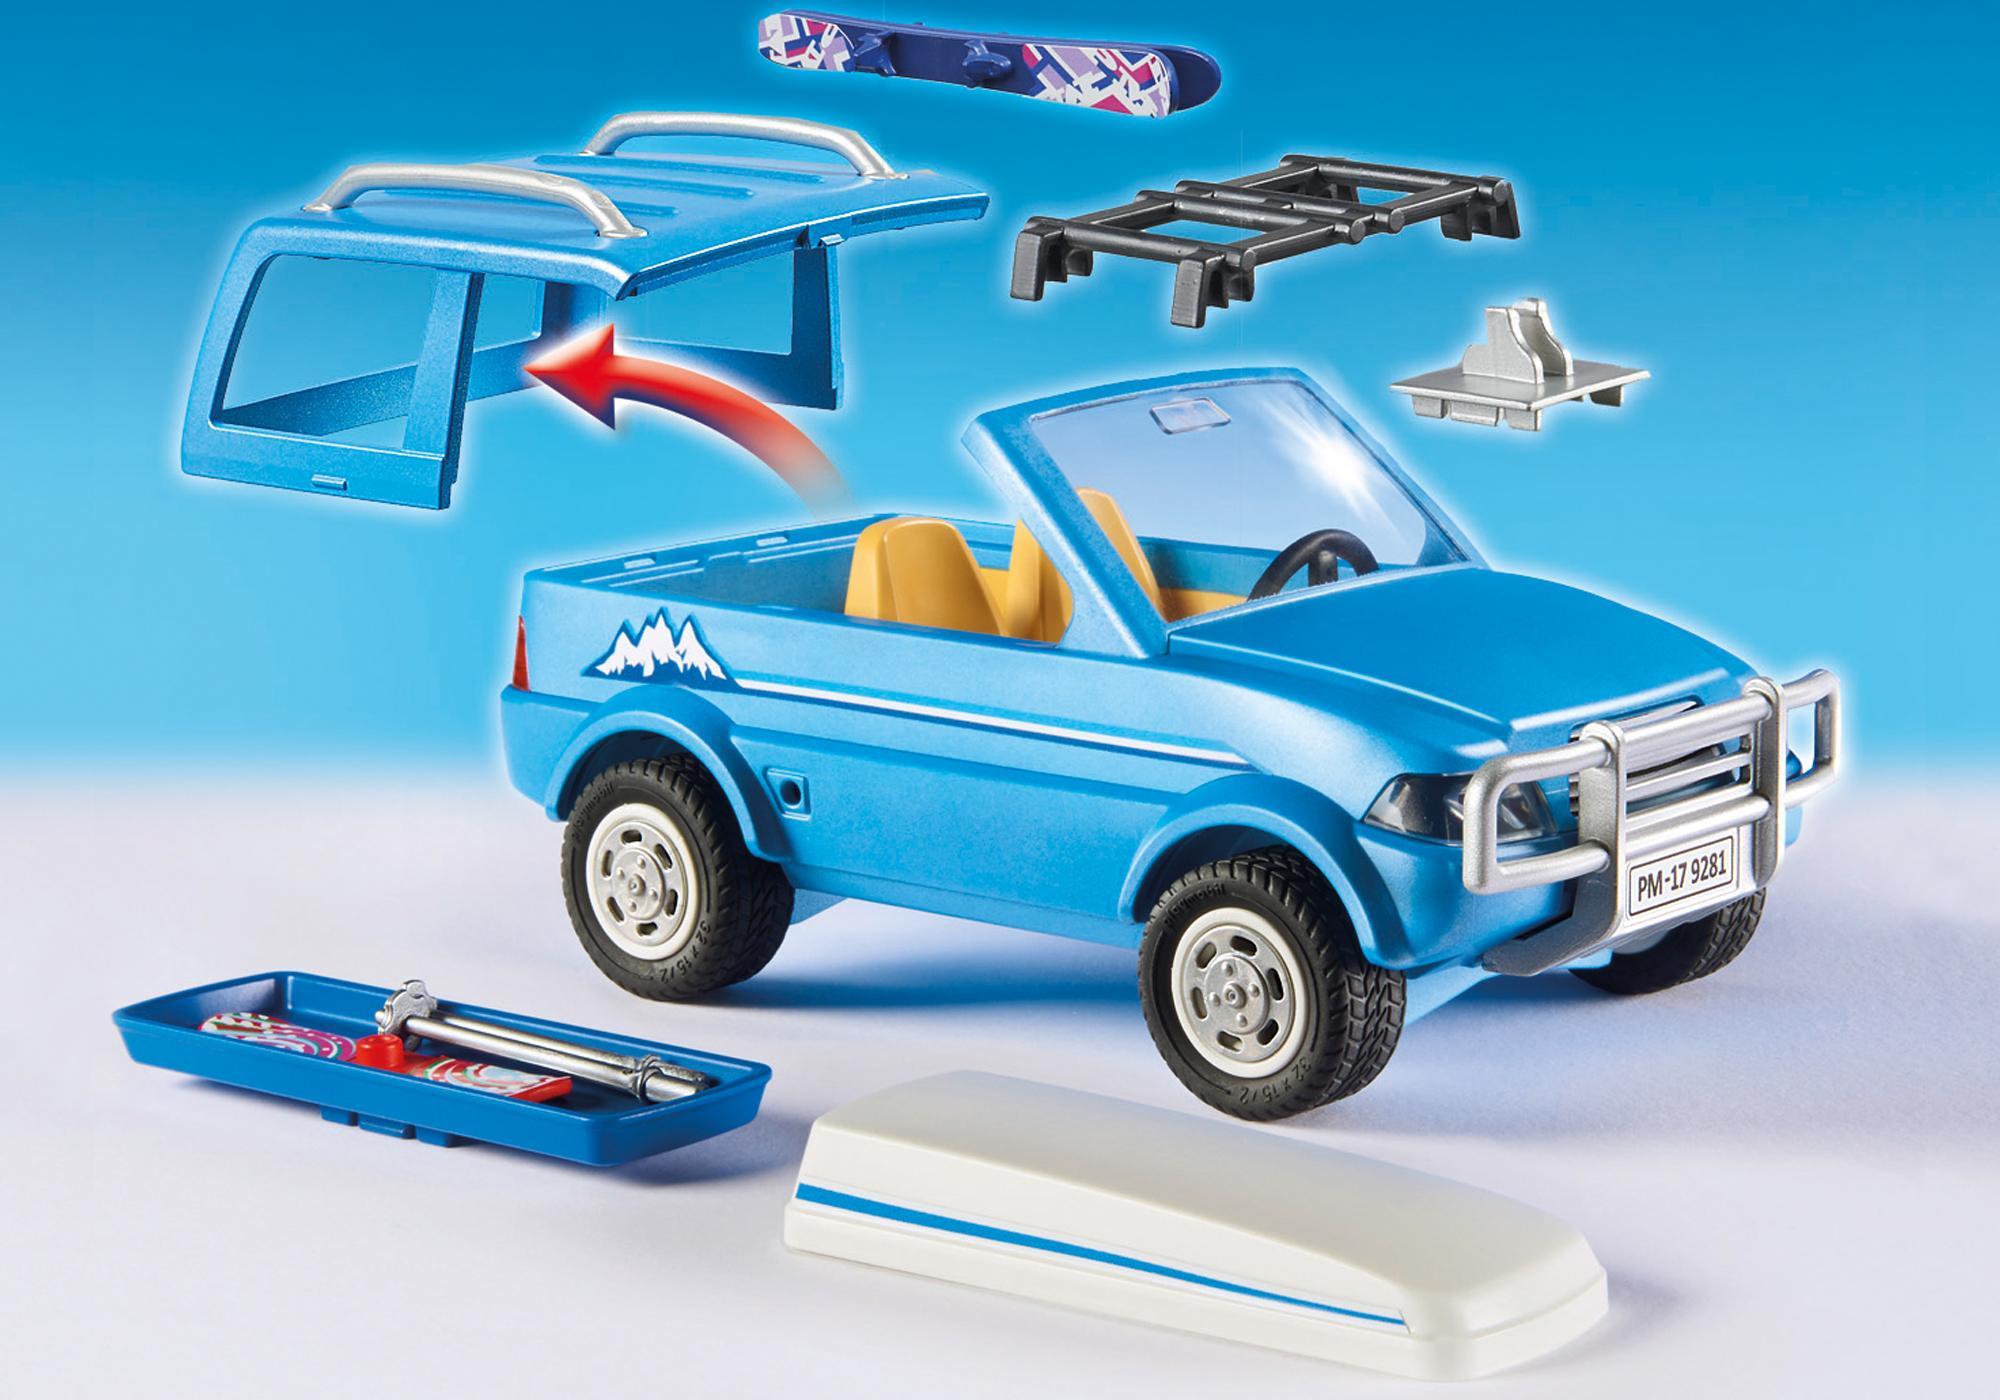 http://media.playmobil.com/i/playmobil/9281_product_extra3/Bil med tagboks